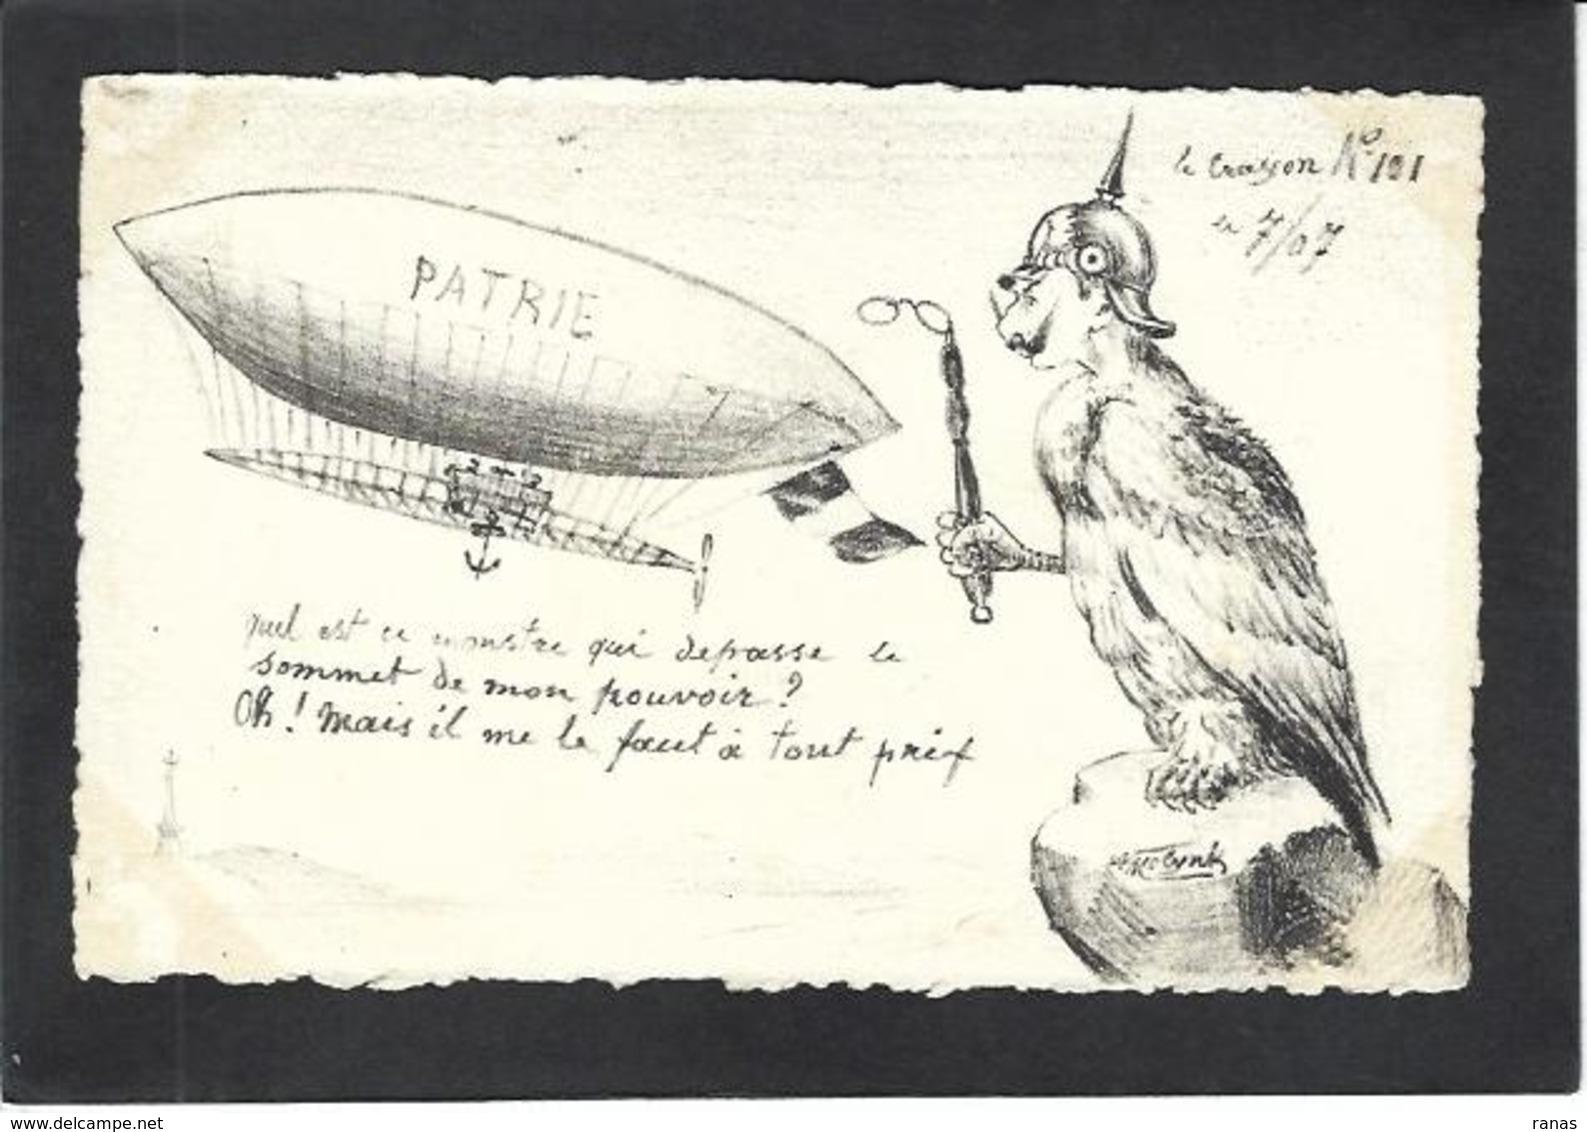 CPA Kaiser MOLYNK Satirique Caricature Estampe Tirage Limité Non Circulé Molynk Dirigeable Aviation - Illustrateurs & Photographes